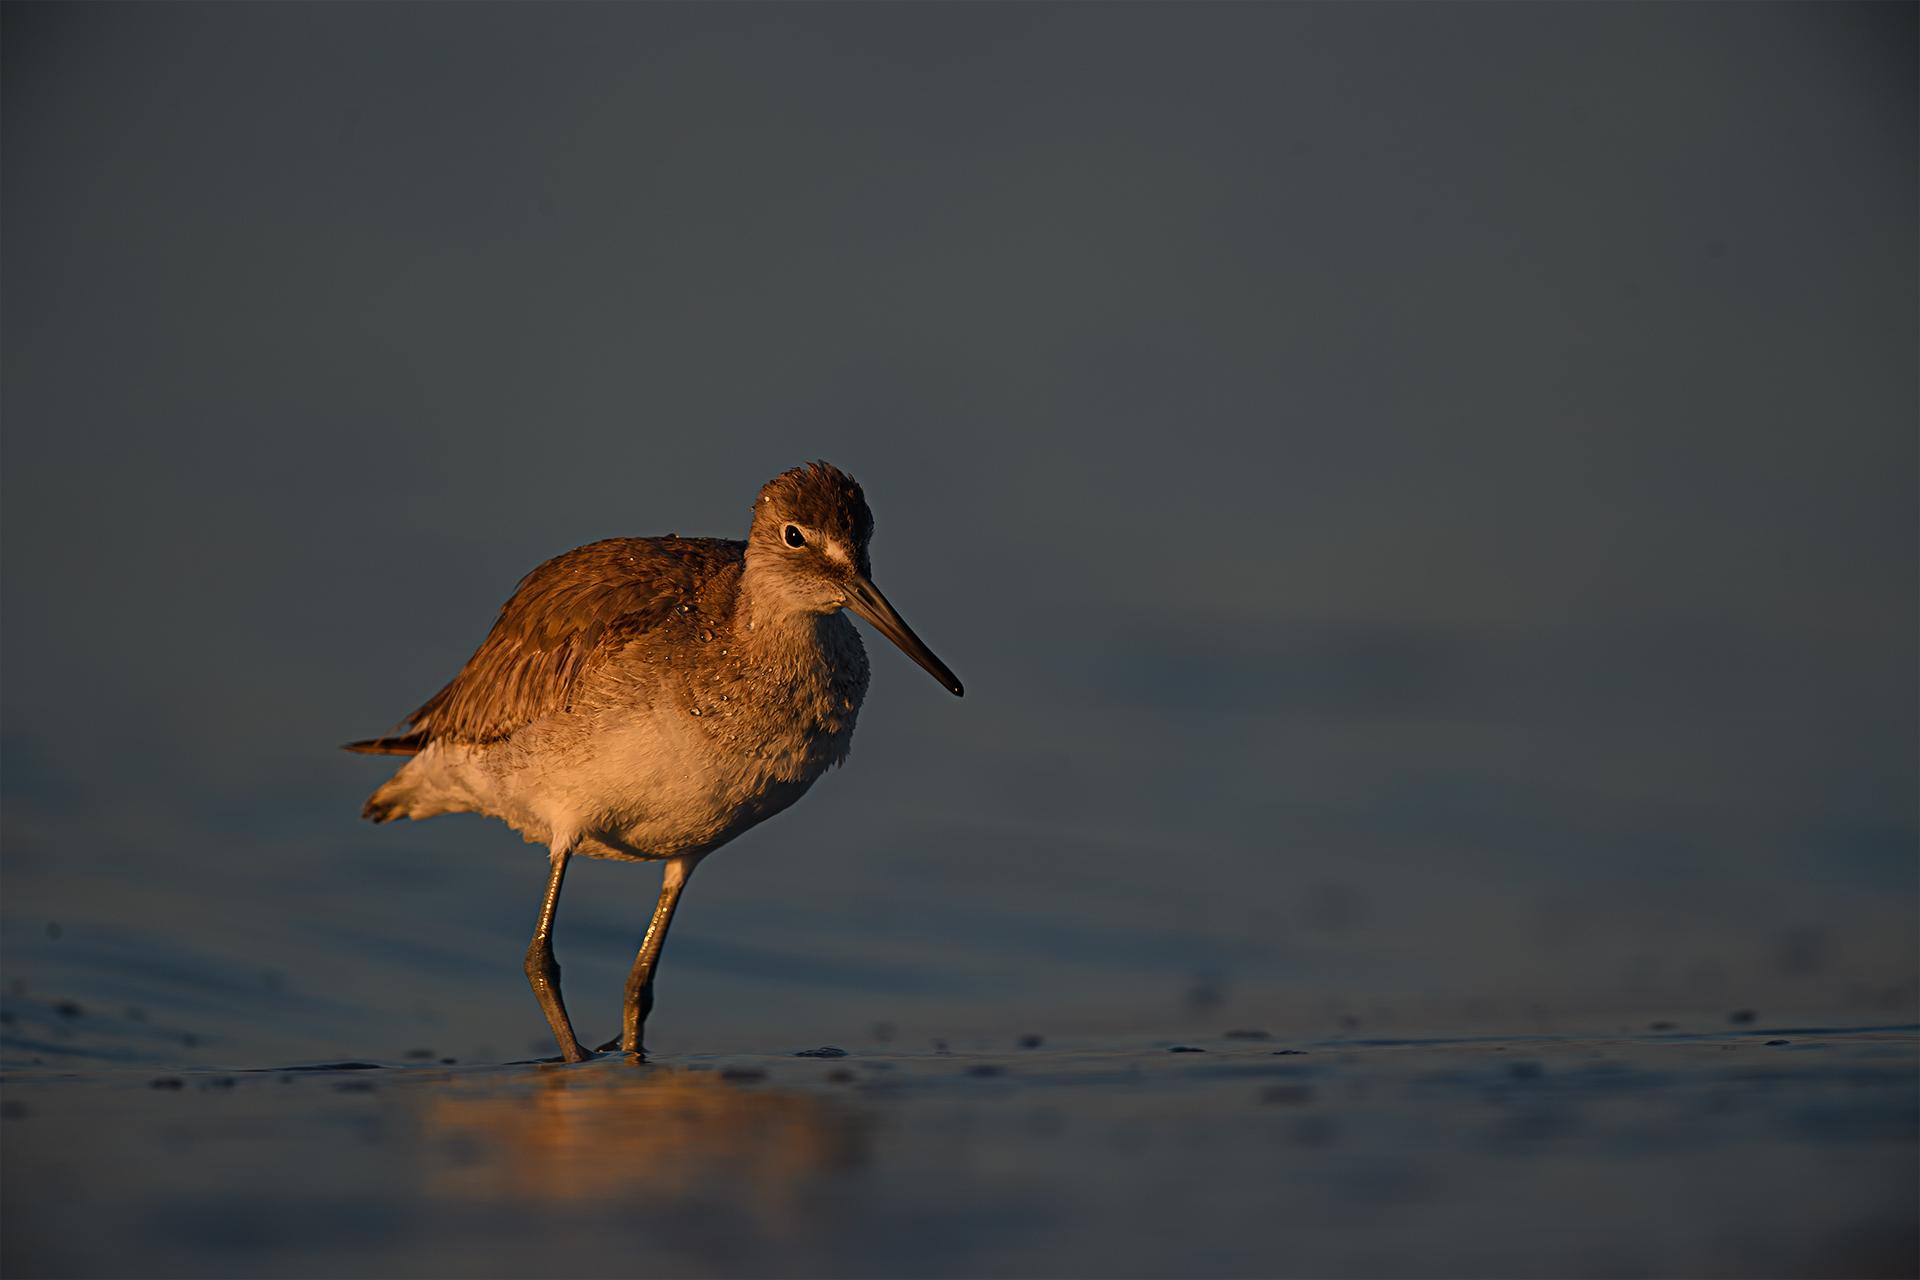 WN-Sunrise Sanibel Island Willet-Carol Smith.jpg